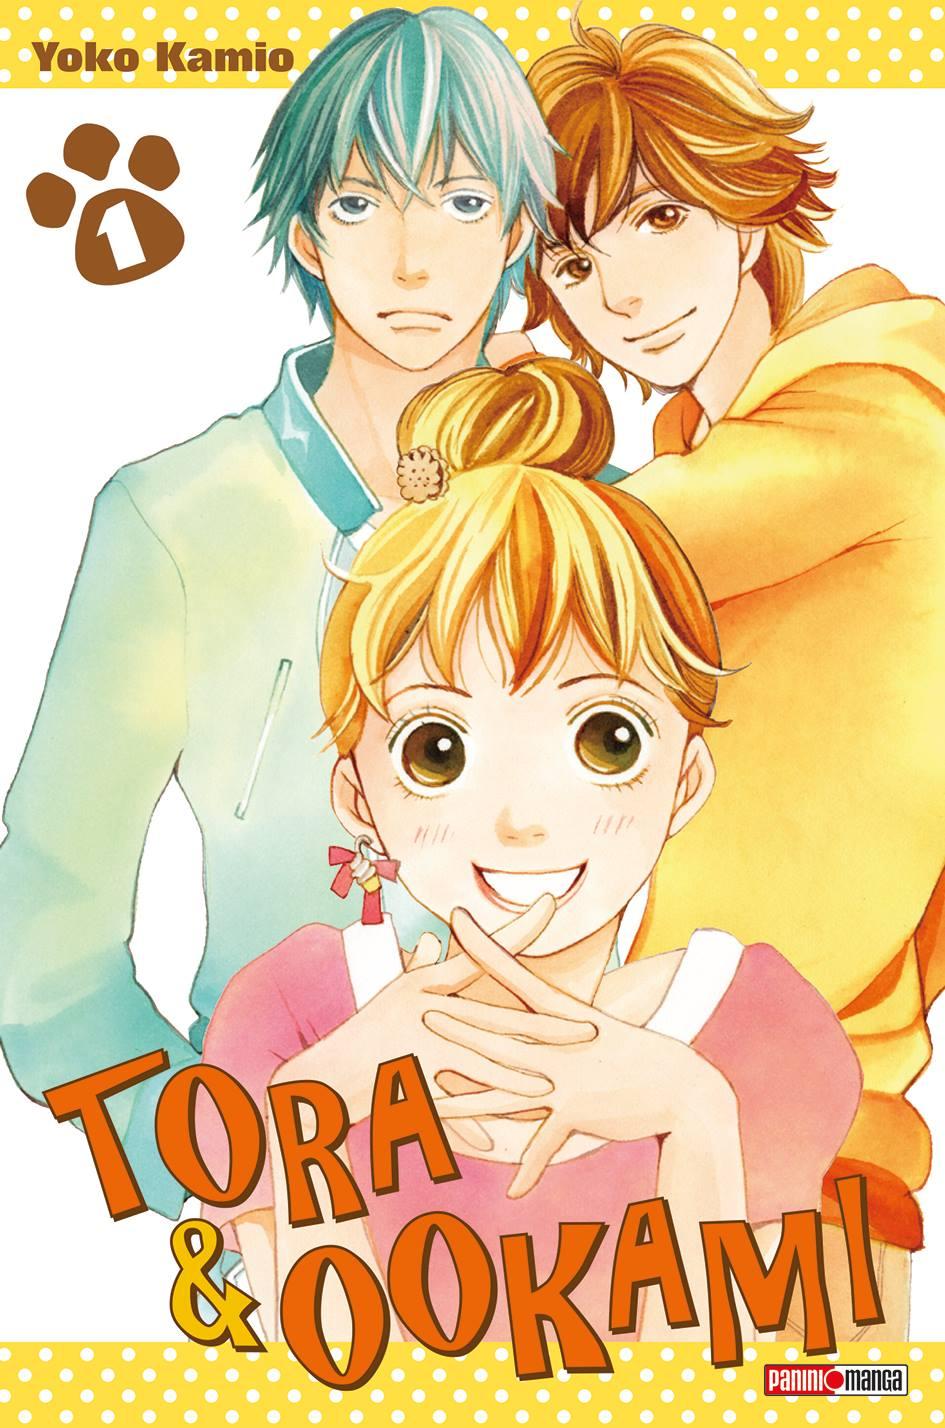 KAMIO Yoko - Tora et Ookami - Vol. 1 Tora-okami-manga-volume-1-simple-75760